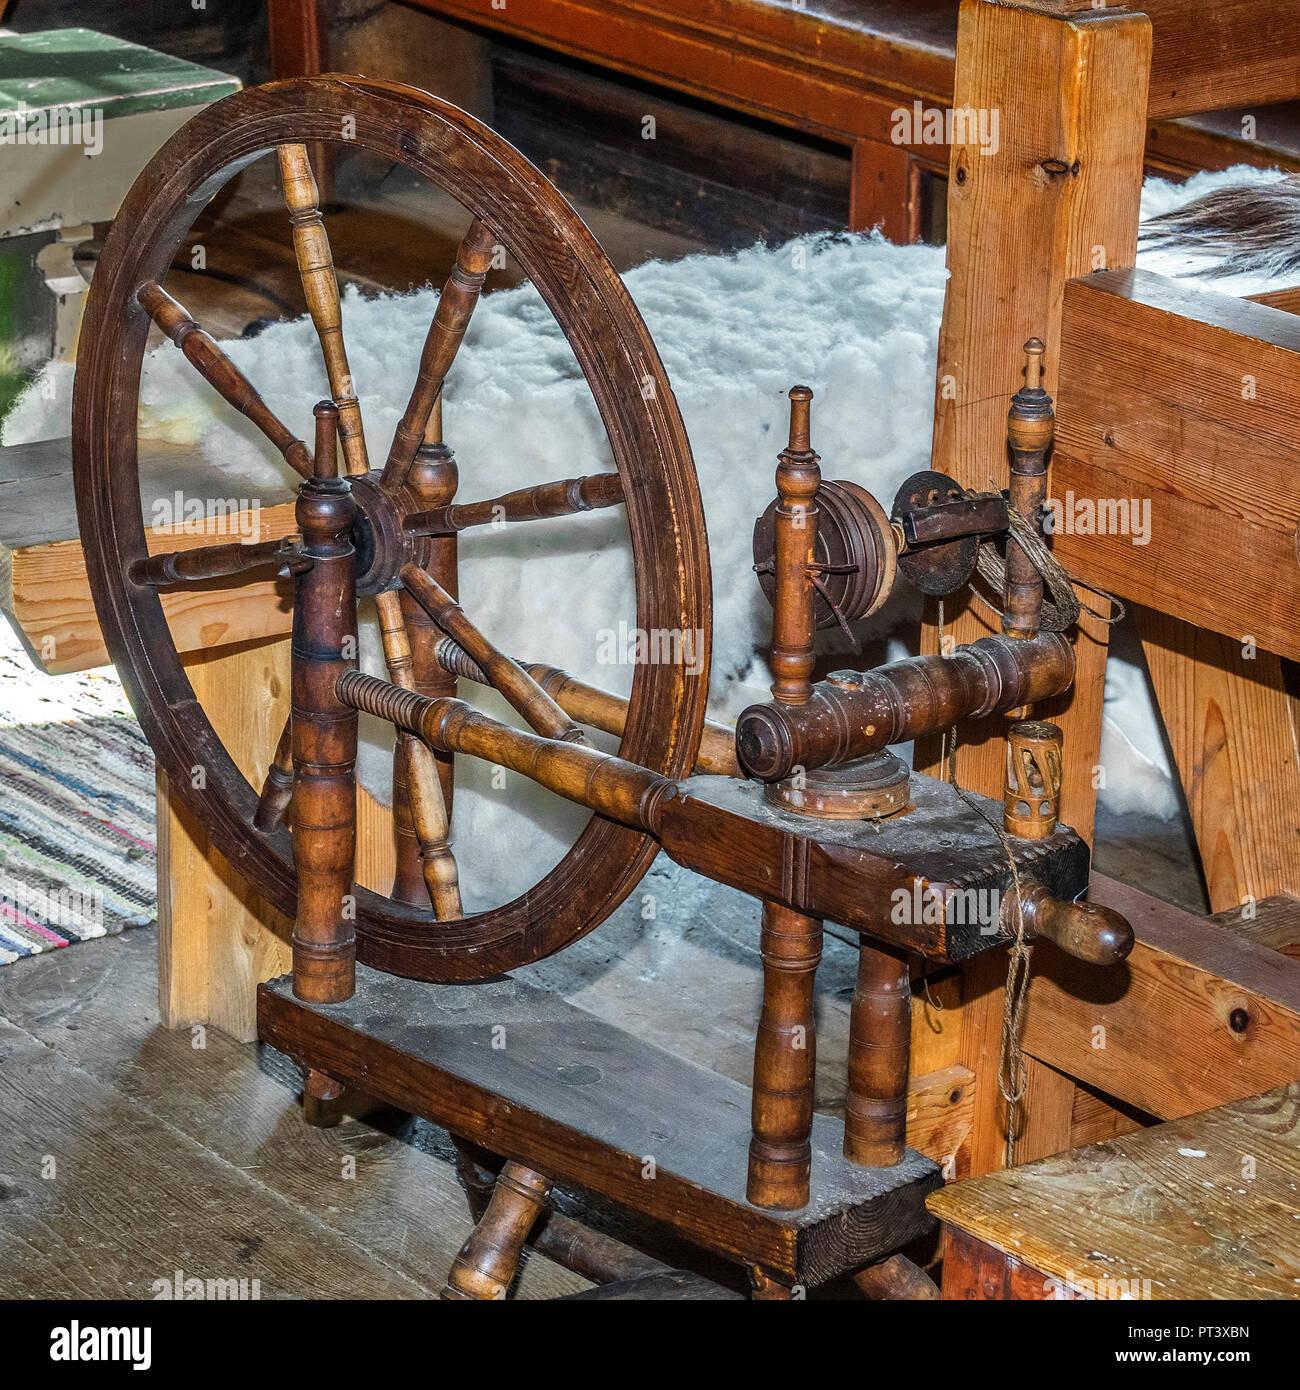 Old Spinning Wheel Sunnmore Museum Alesund Norway Stock Photo Alamy